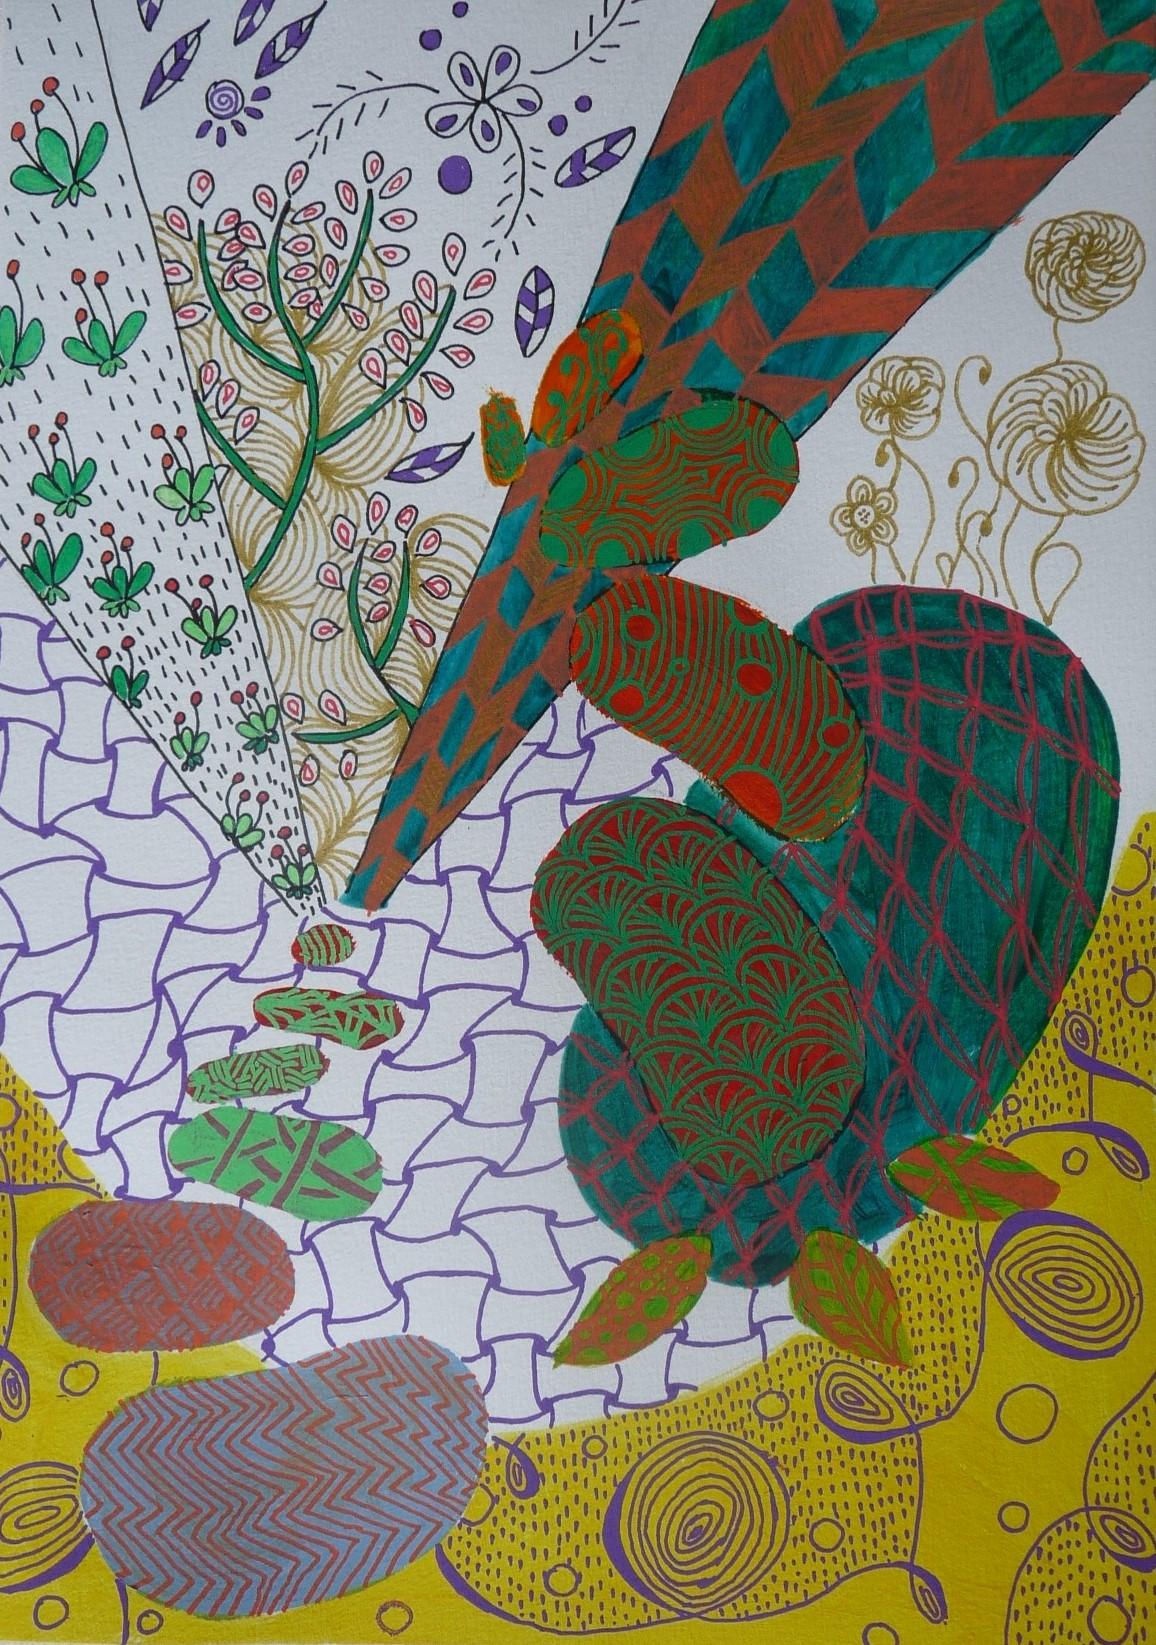 peinture abstraite elize marina lefloch peinture collective zentangle